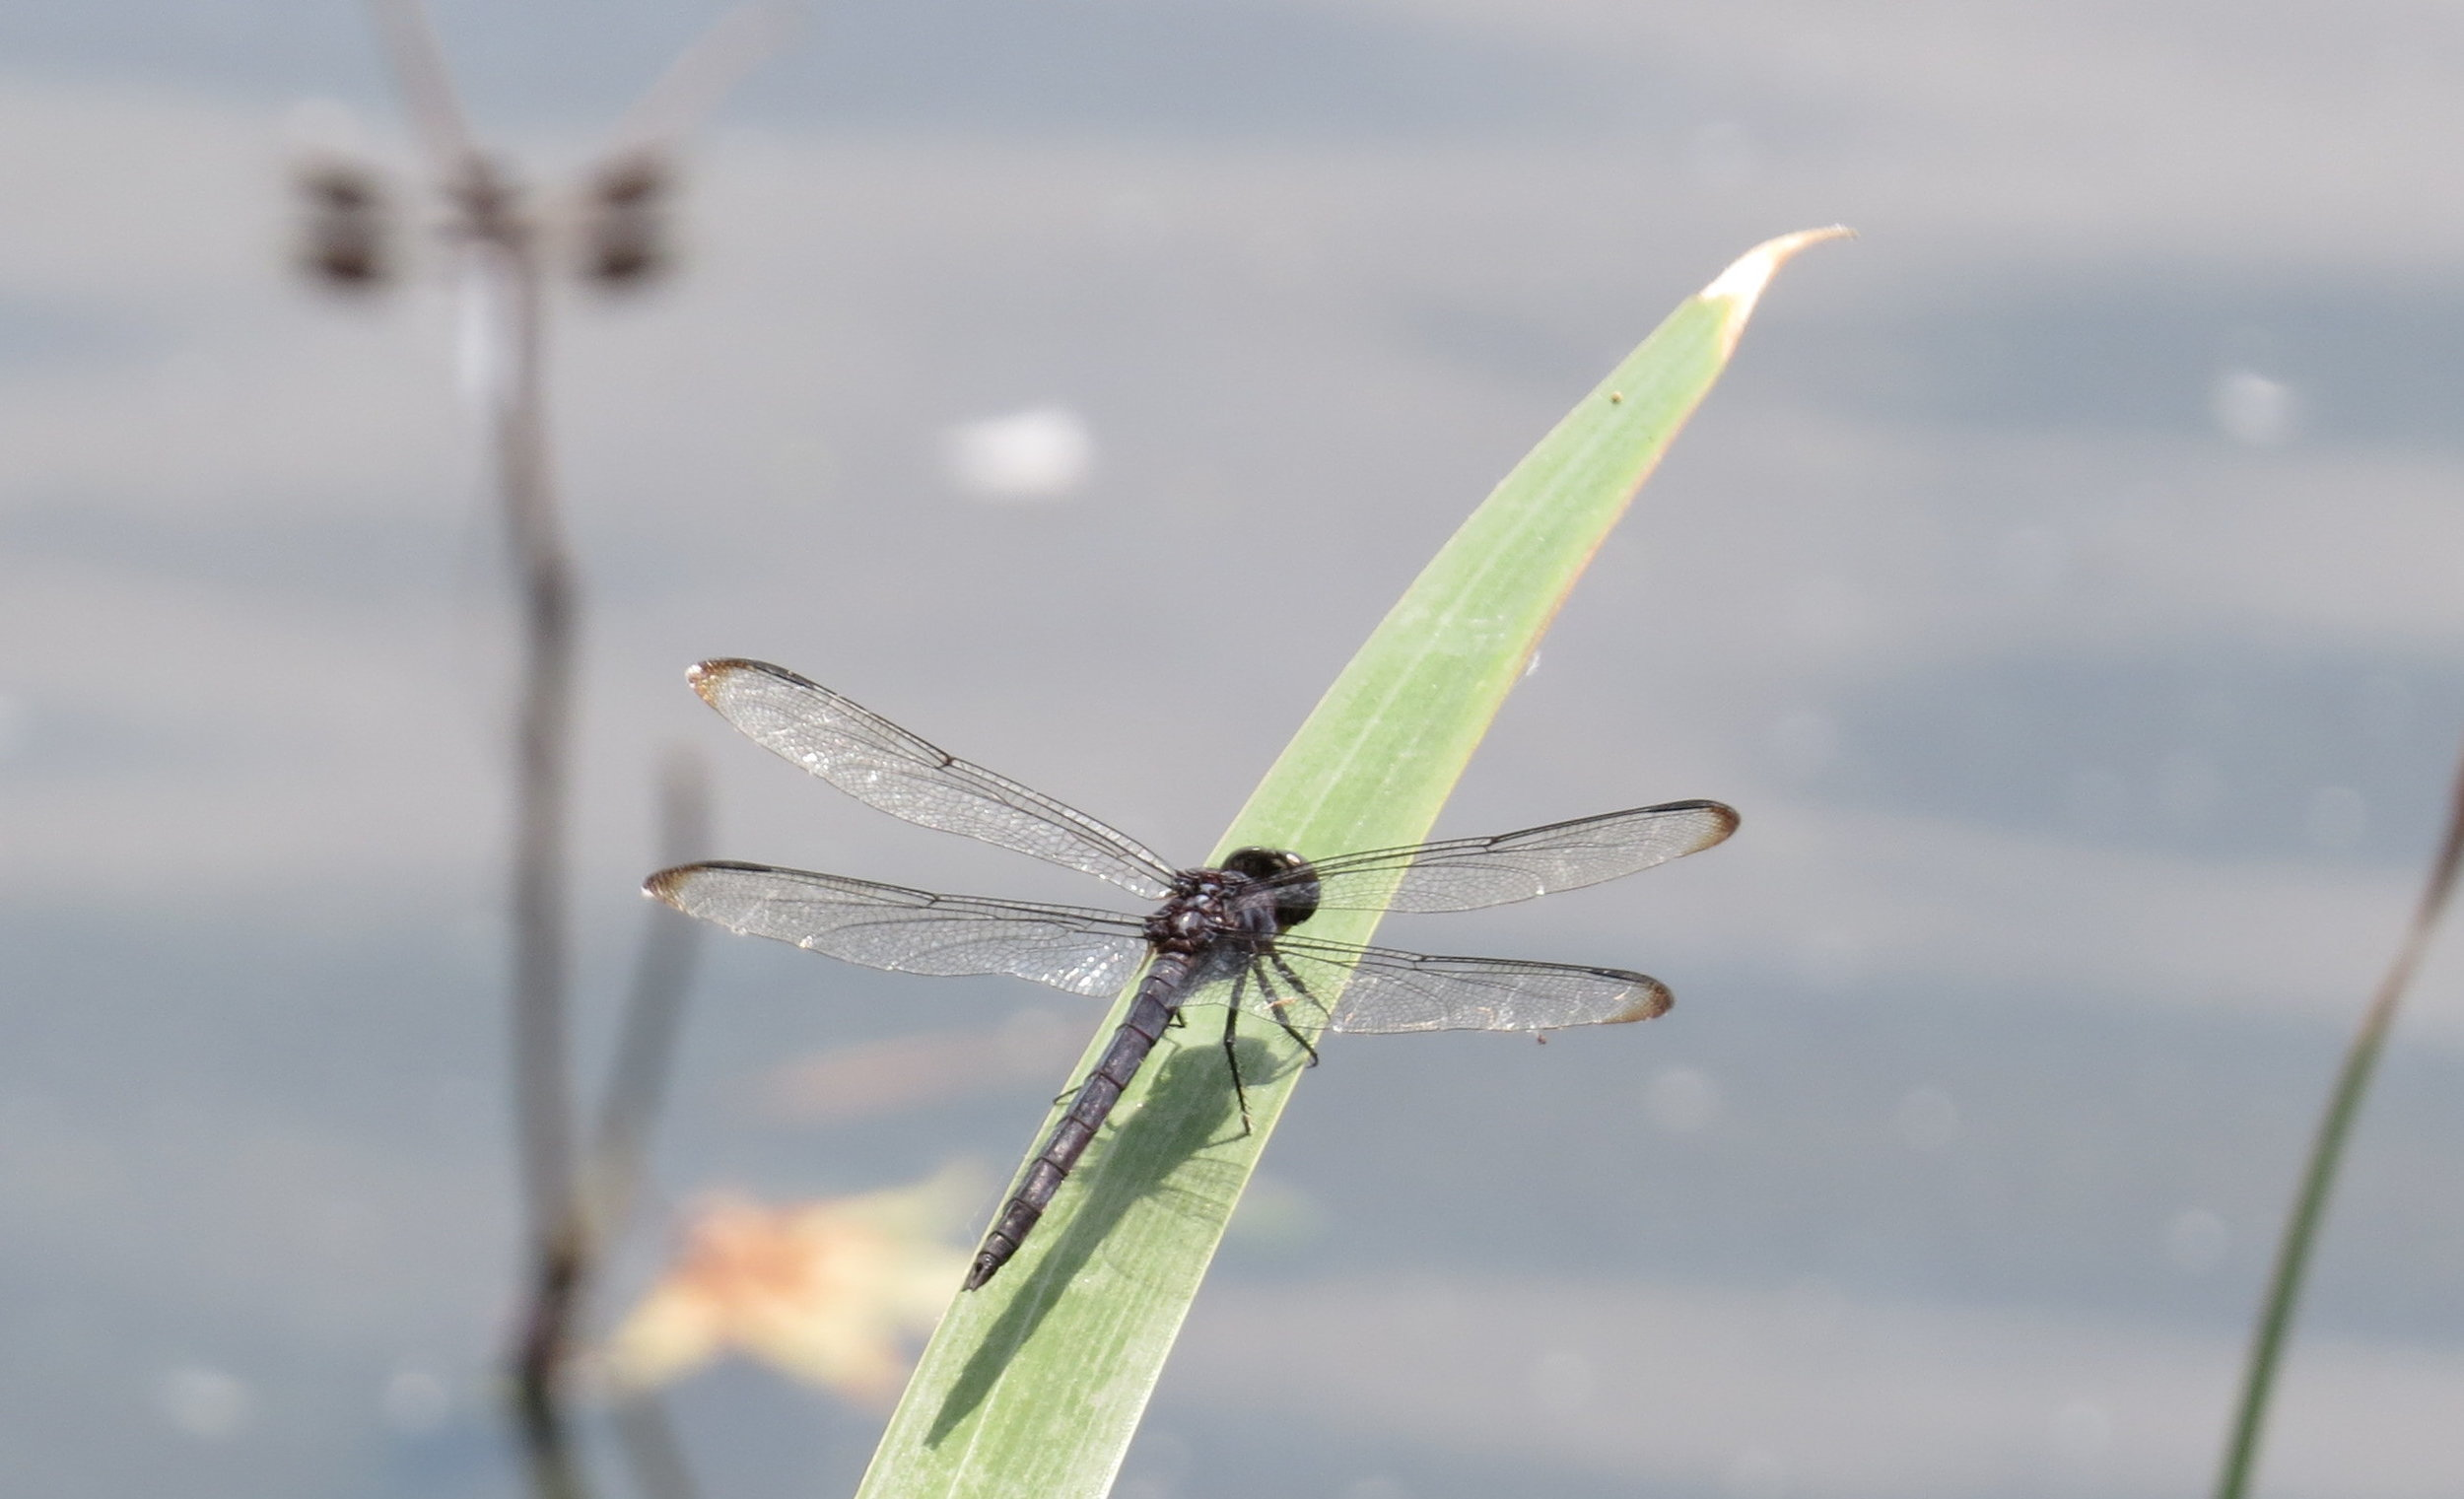 Dragonflies rest